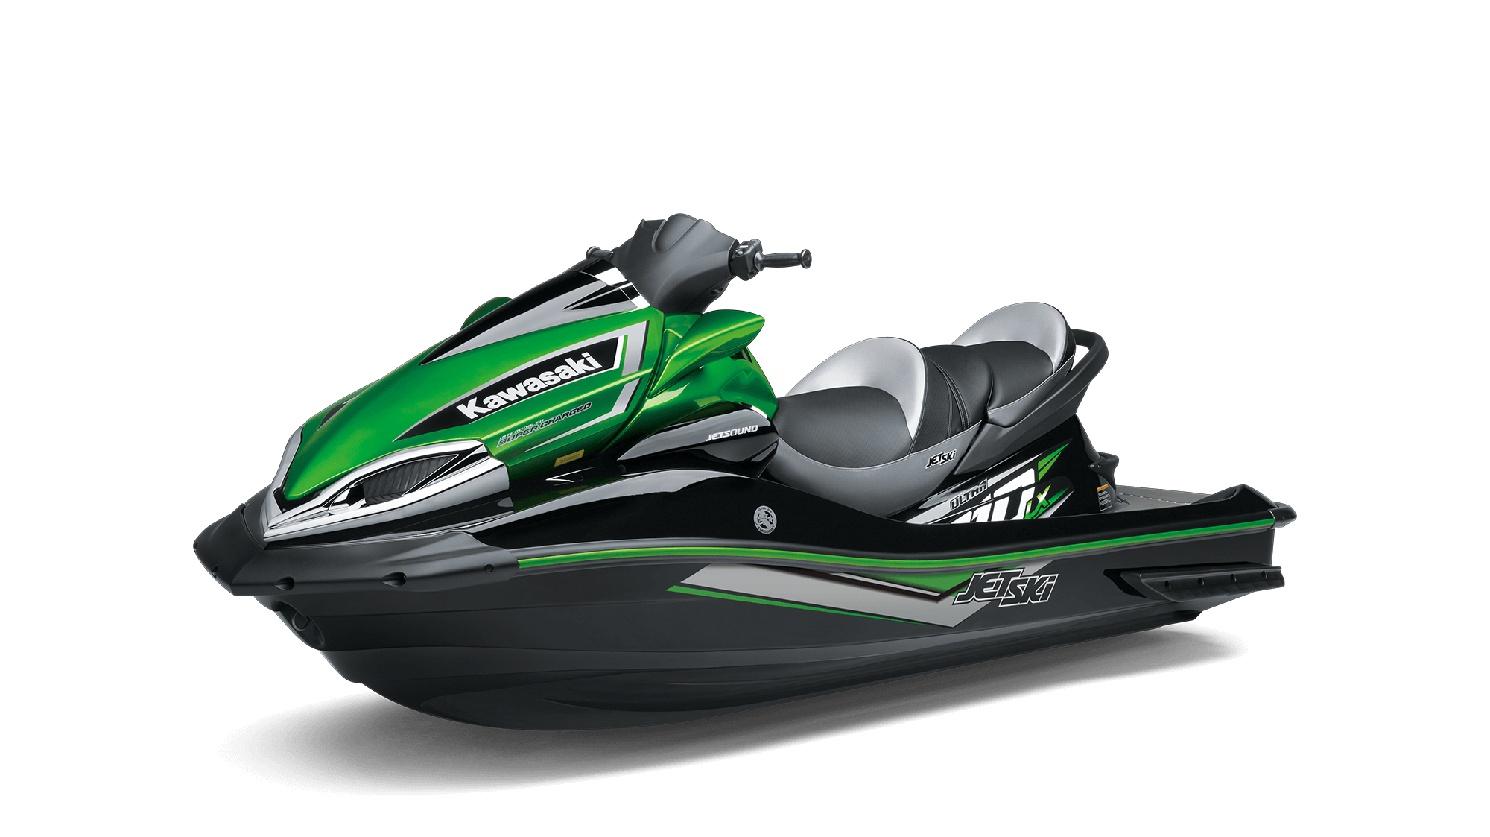 Kawasaki JET SKI ULTRA 310LX Ébène / Vert Lime Bonbon 2019